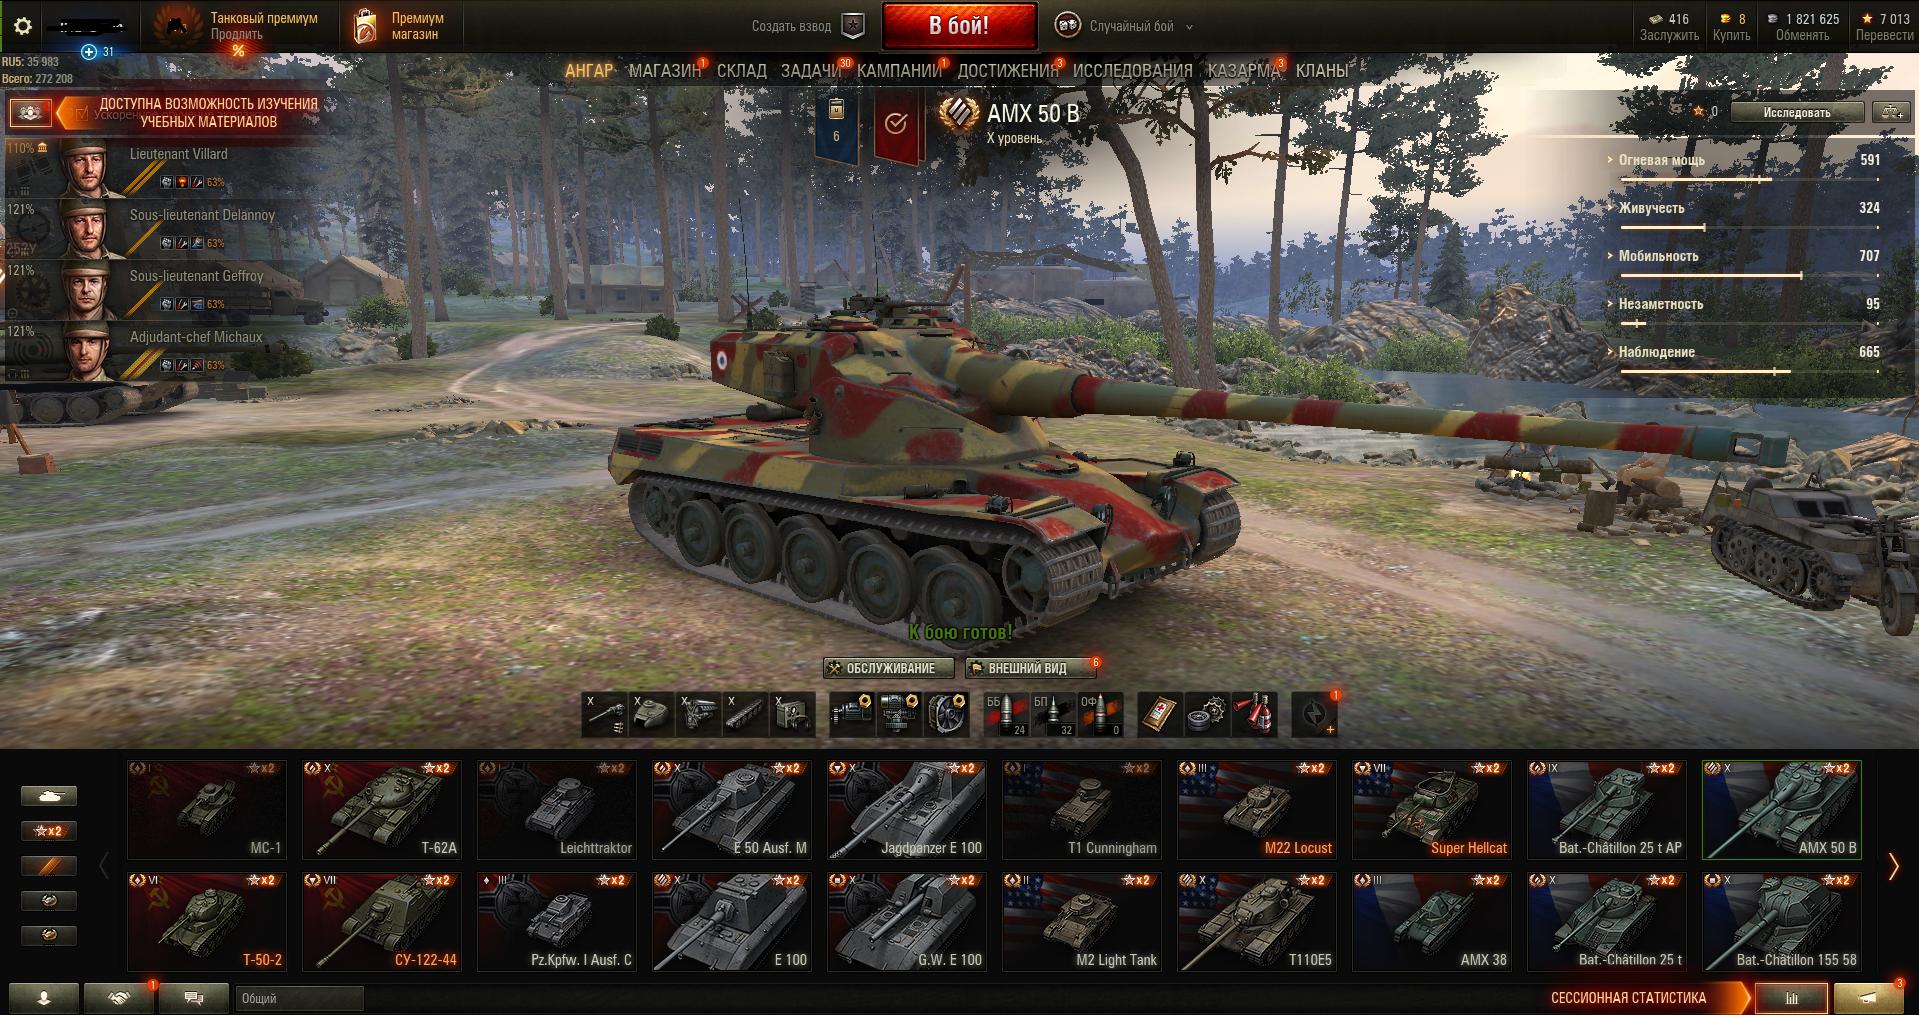 WoT (9 топов, Су-122-44, всего 30 танков)